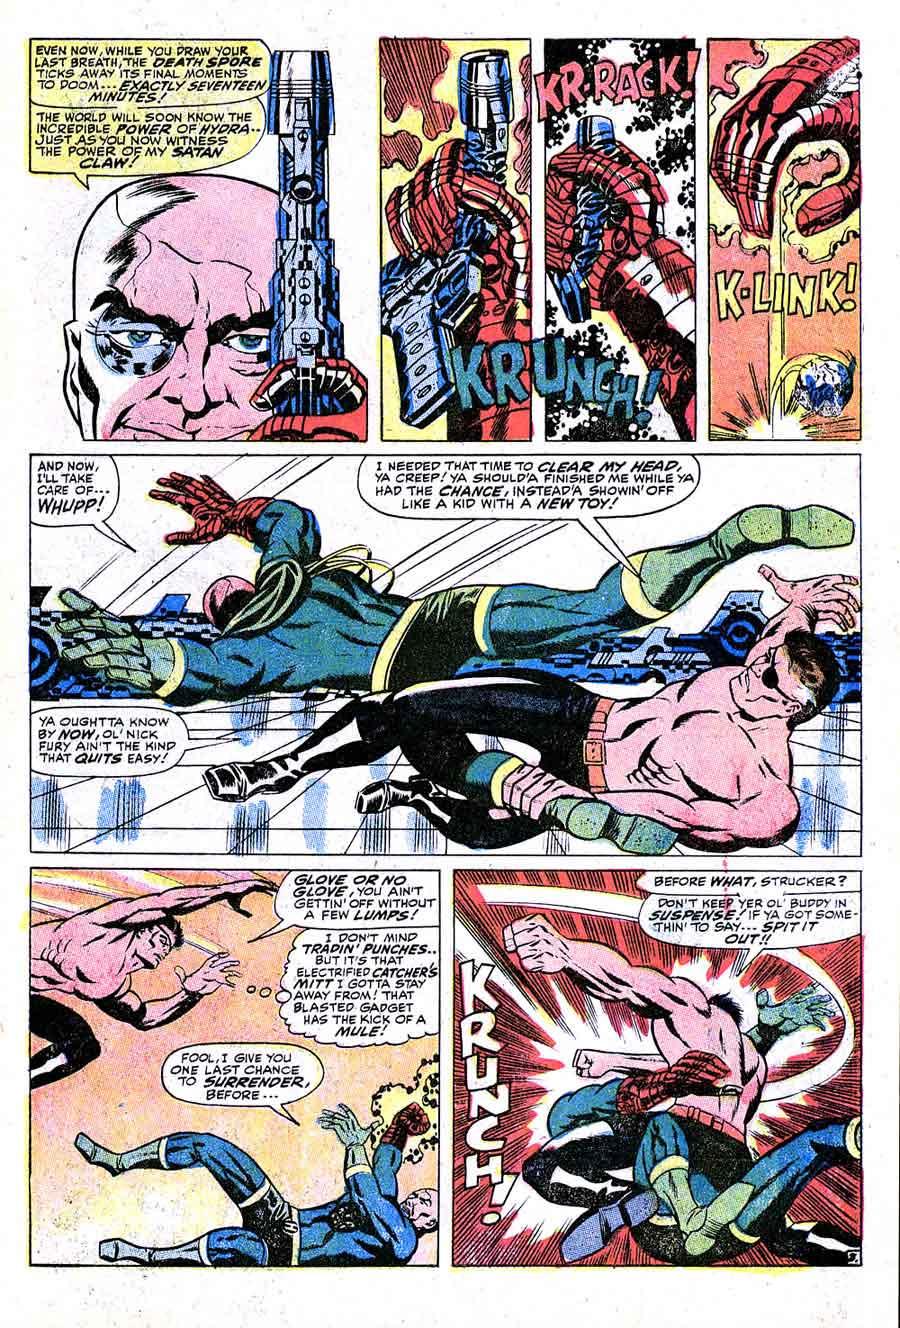 Strange Tales v1 #158 nick fury shield comic book page art by Jim Steranko